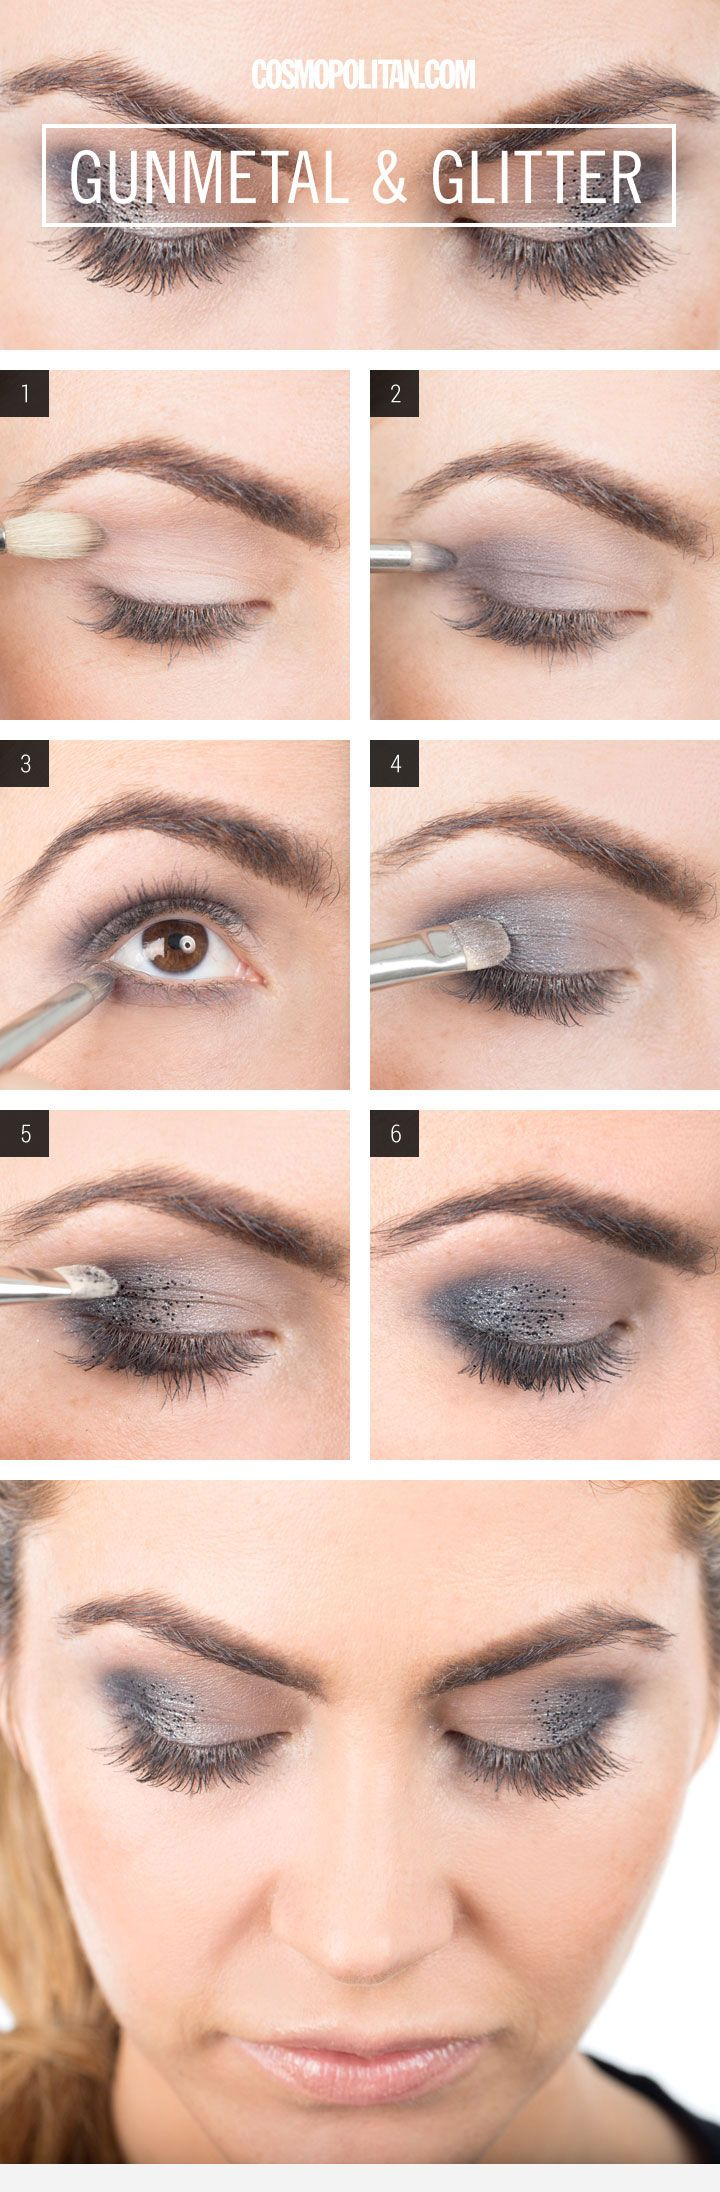 610 best Eye-Makeup Tutorials & Ideas images on Pinterest